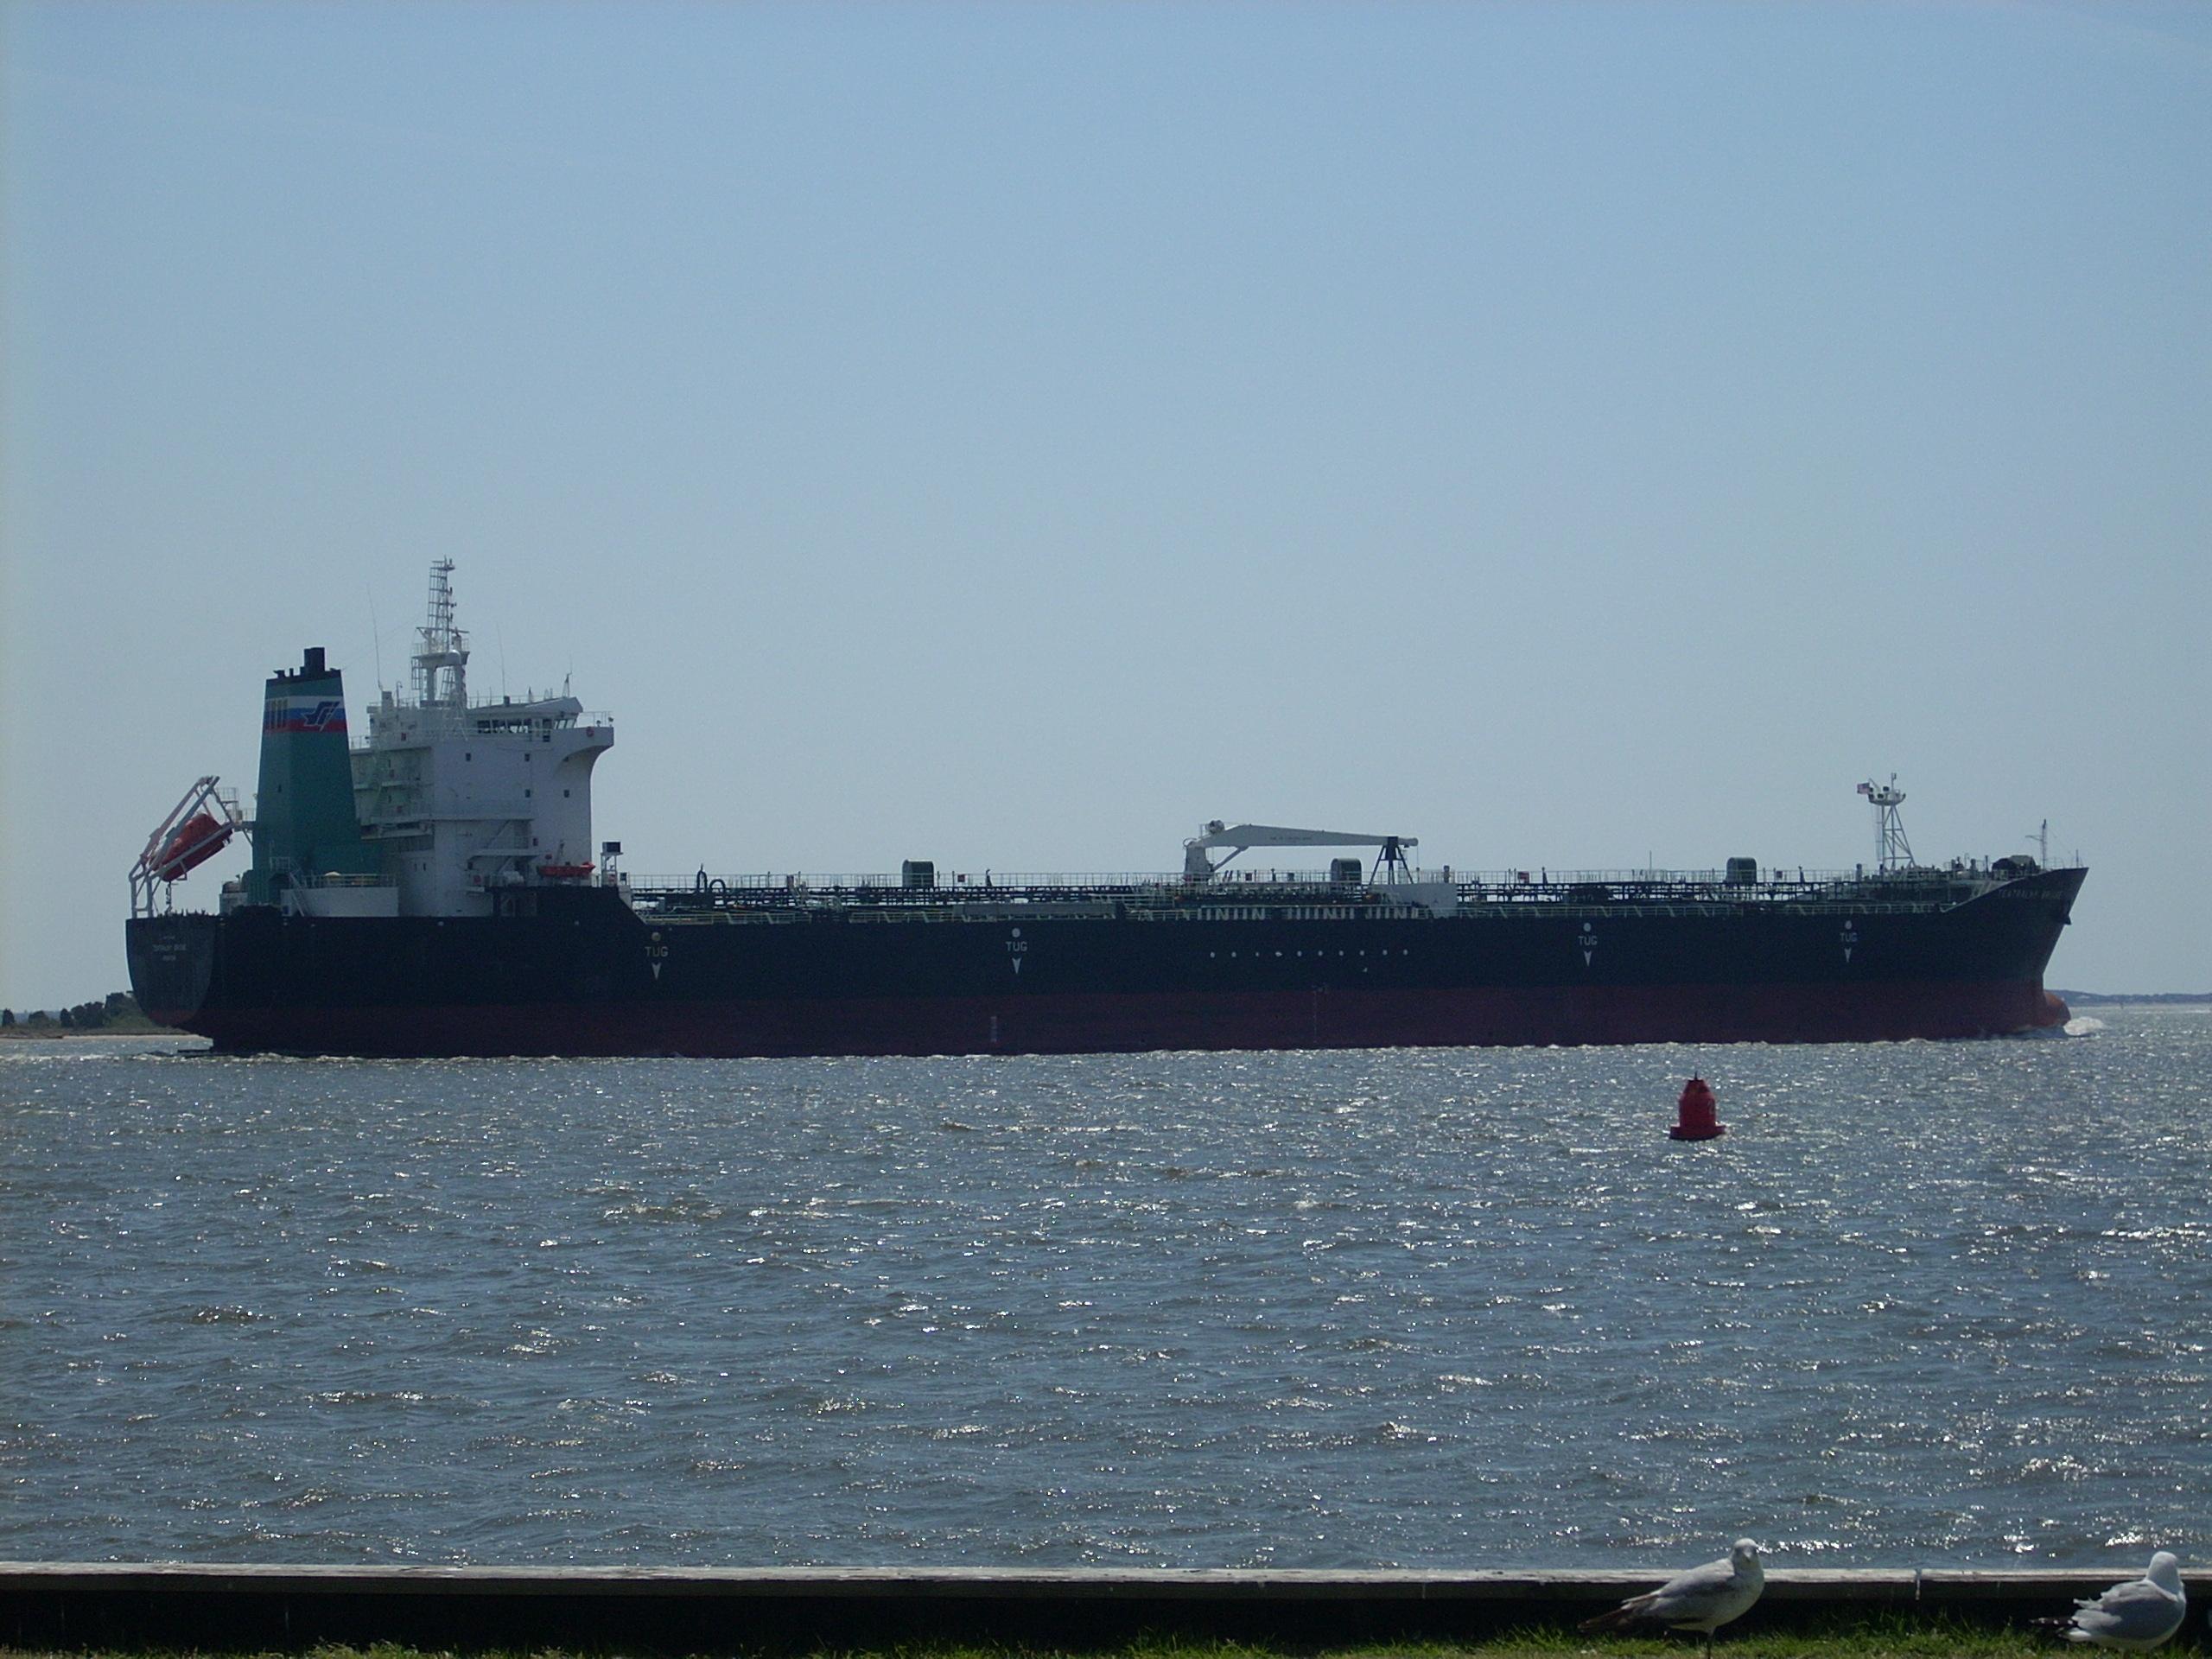 File:Cargo Ship at Southport1.JPG - Wikipedia, the free encyclopedia